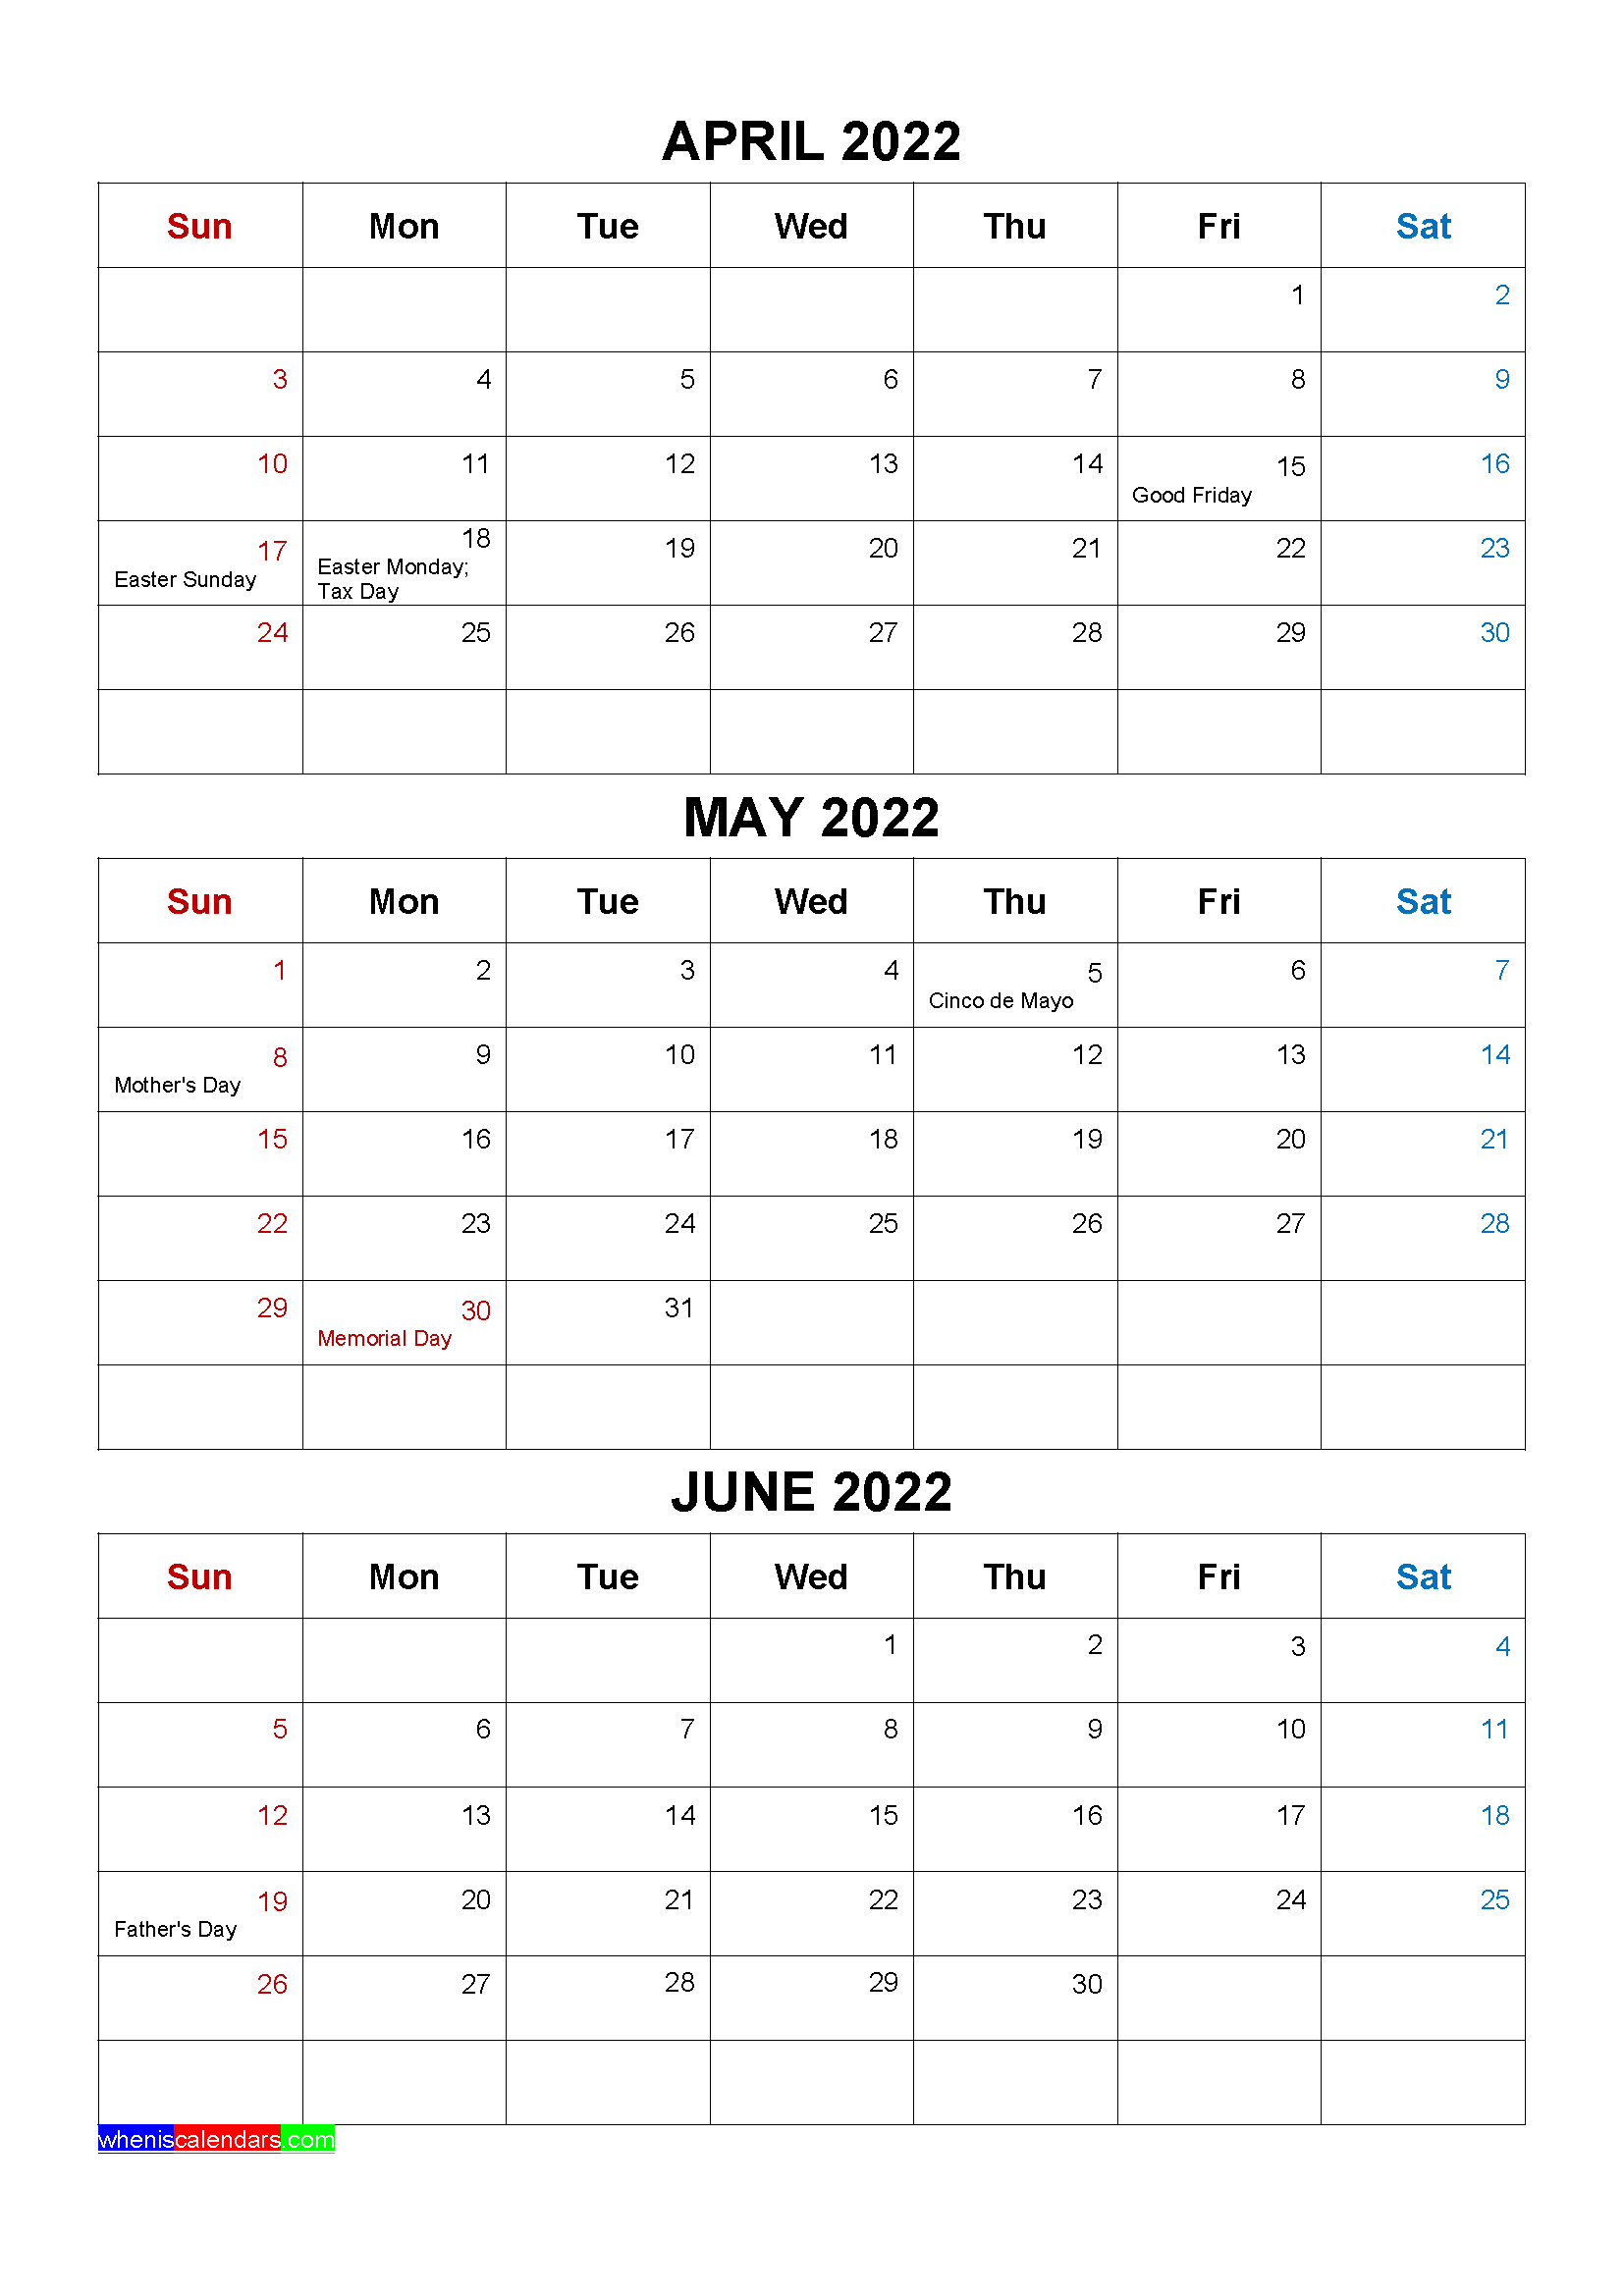 April May 2022 Calendar.Free April May June 2022 Calendar With Holidays Four Quarters Calendar Printables Calendar Template Free Printable Calendar